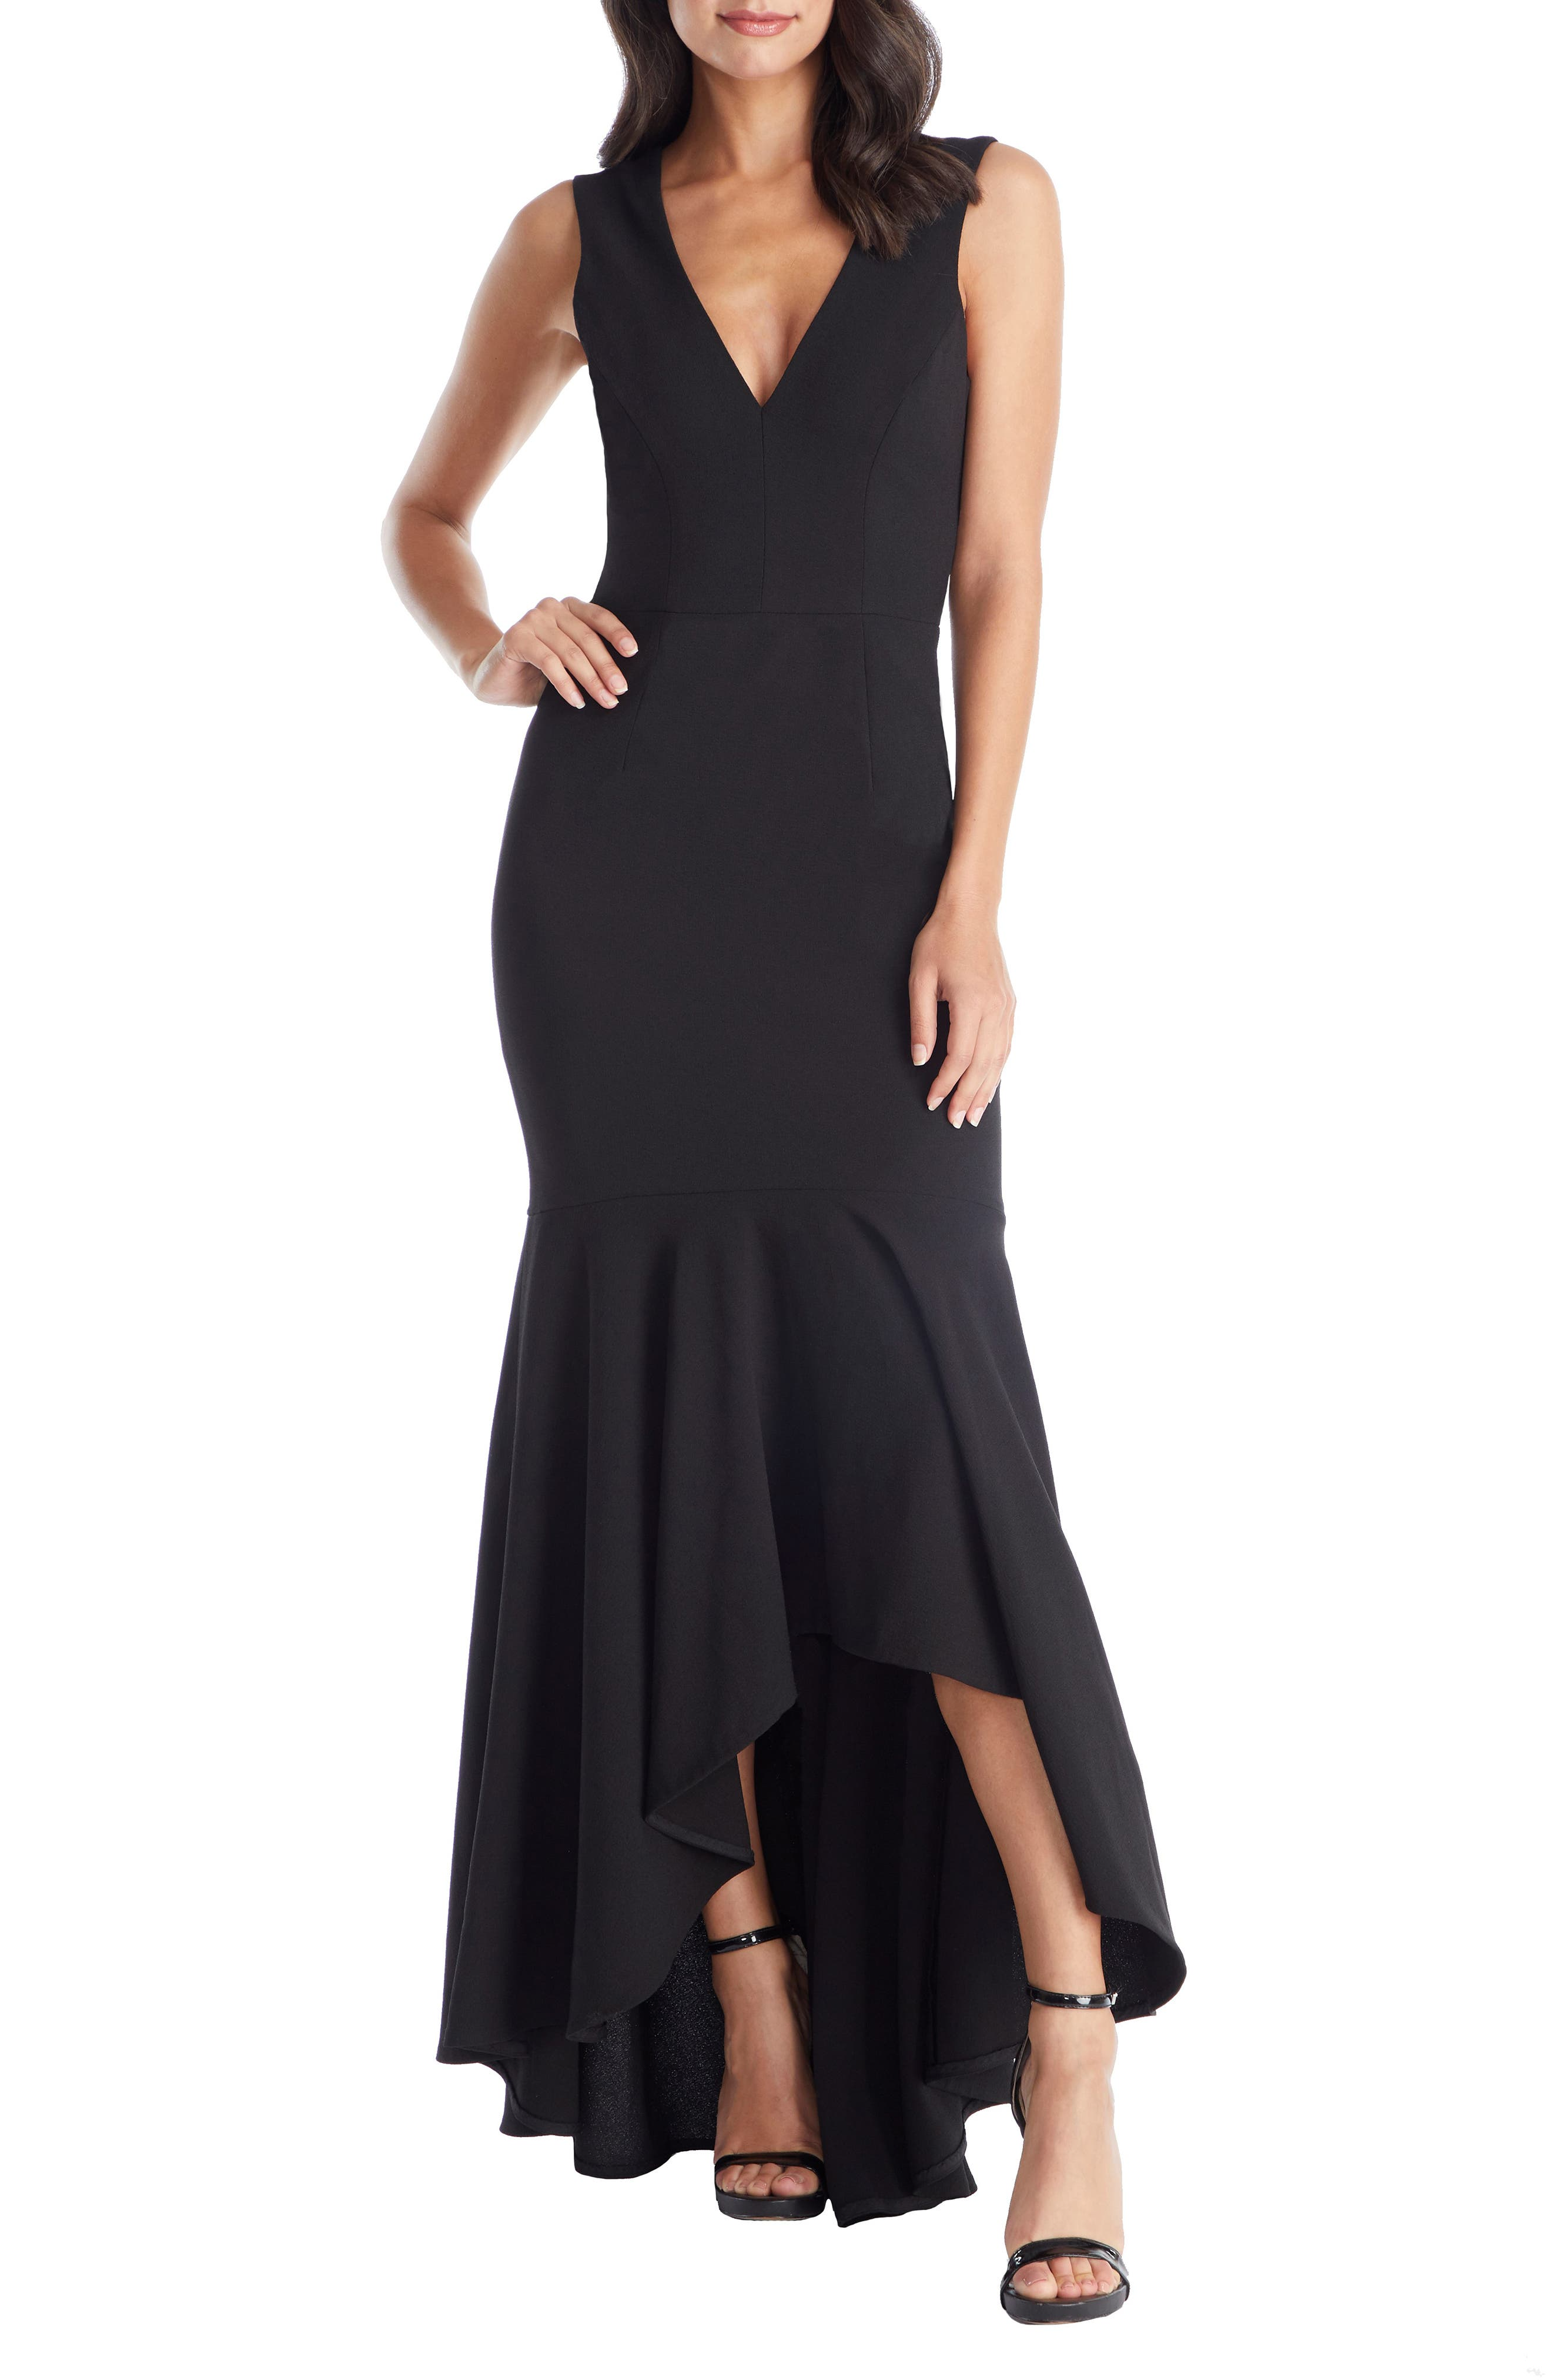 DRESS THE POPULATION, Demi High/Low Mermaid Hem Evening Dress, Main thumbnail 1, color, BLACK